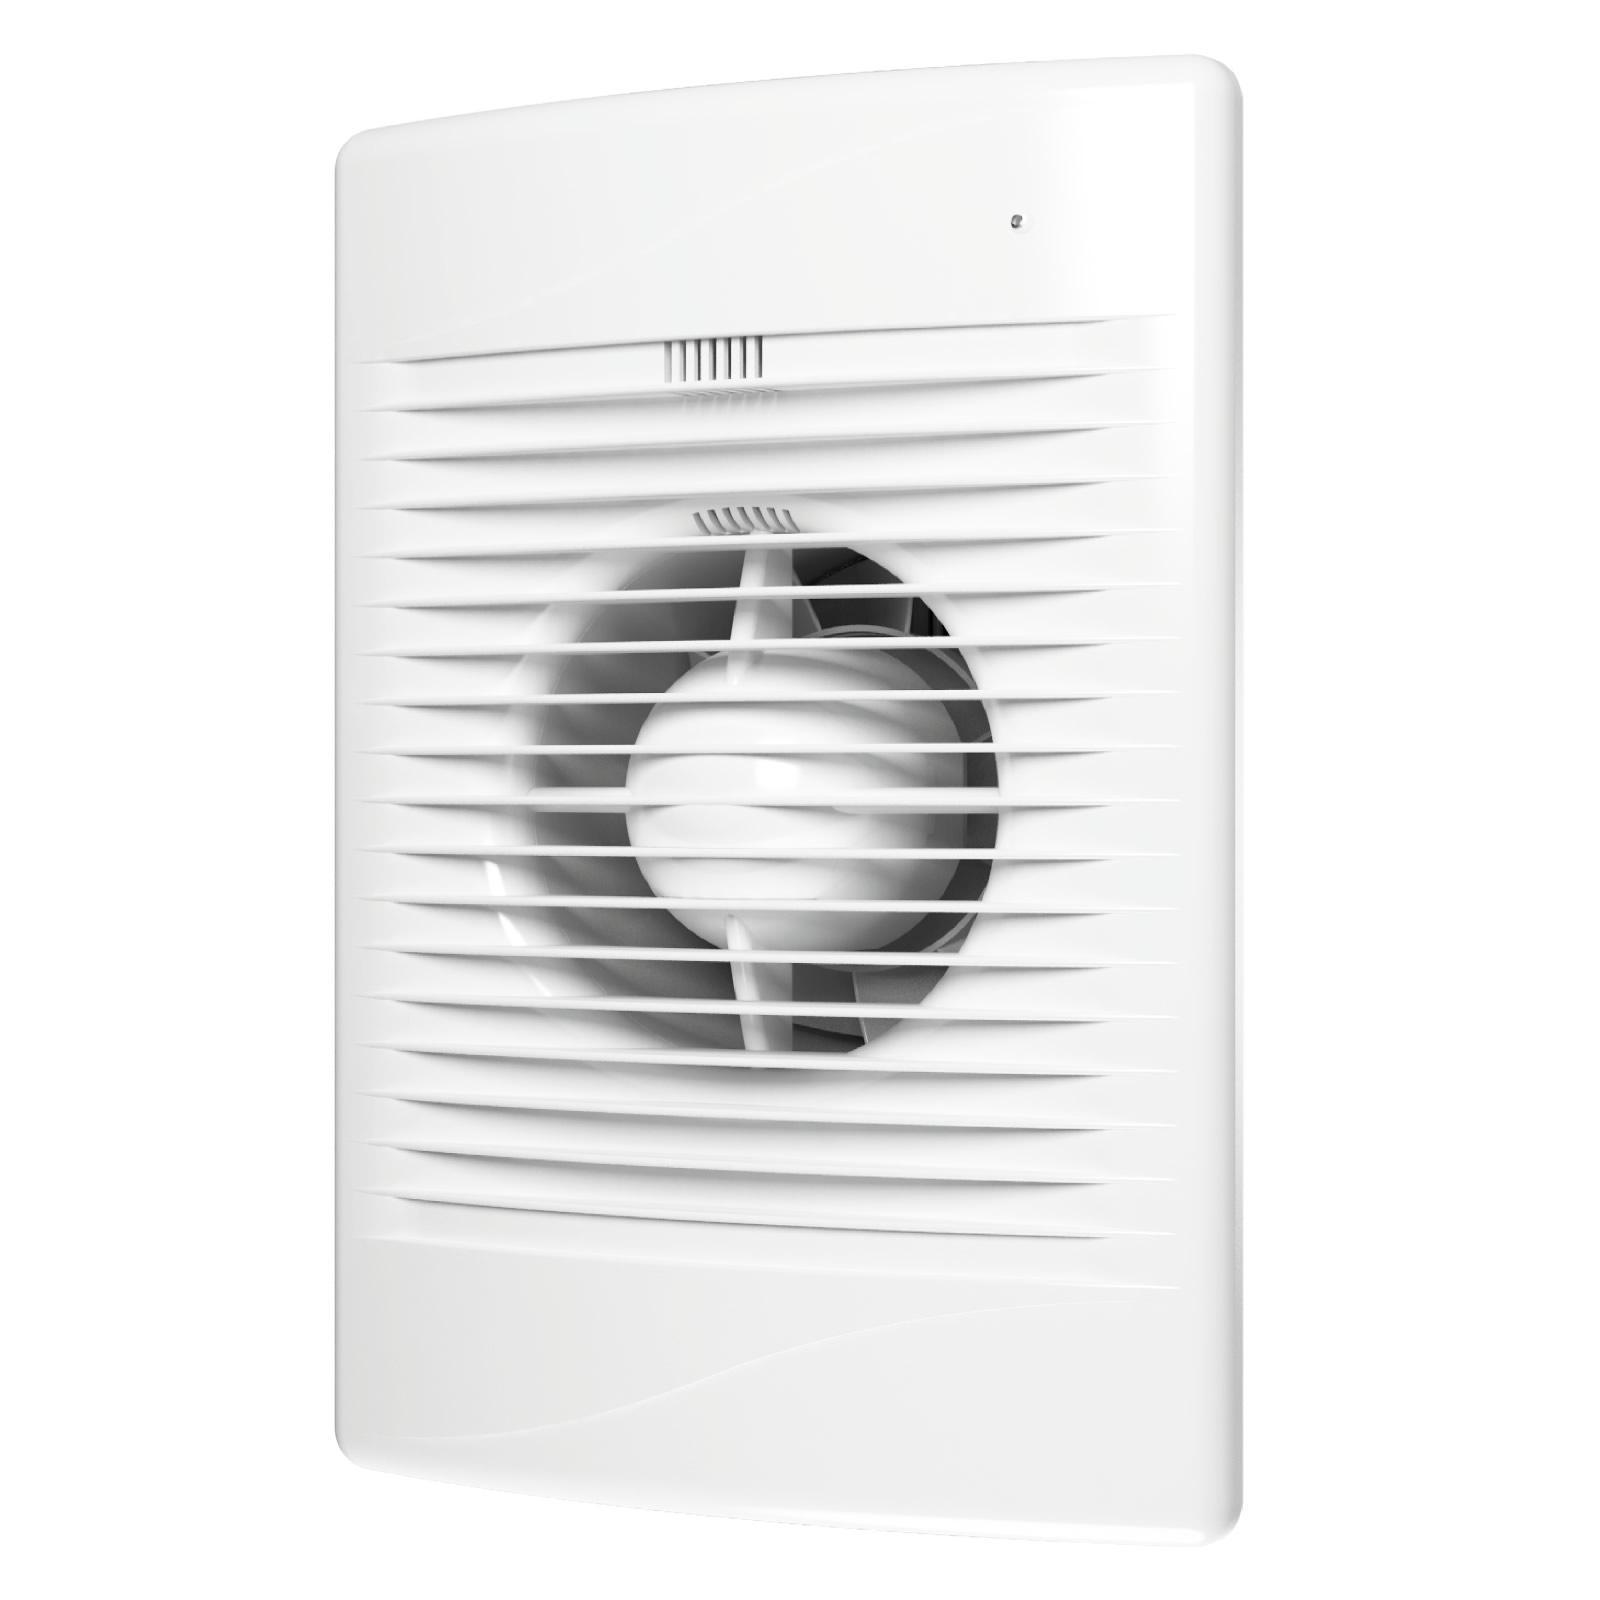 Вентилятор Diciti Standard 4ht